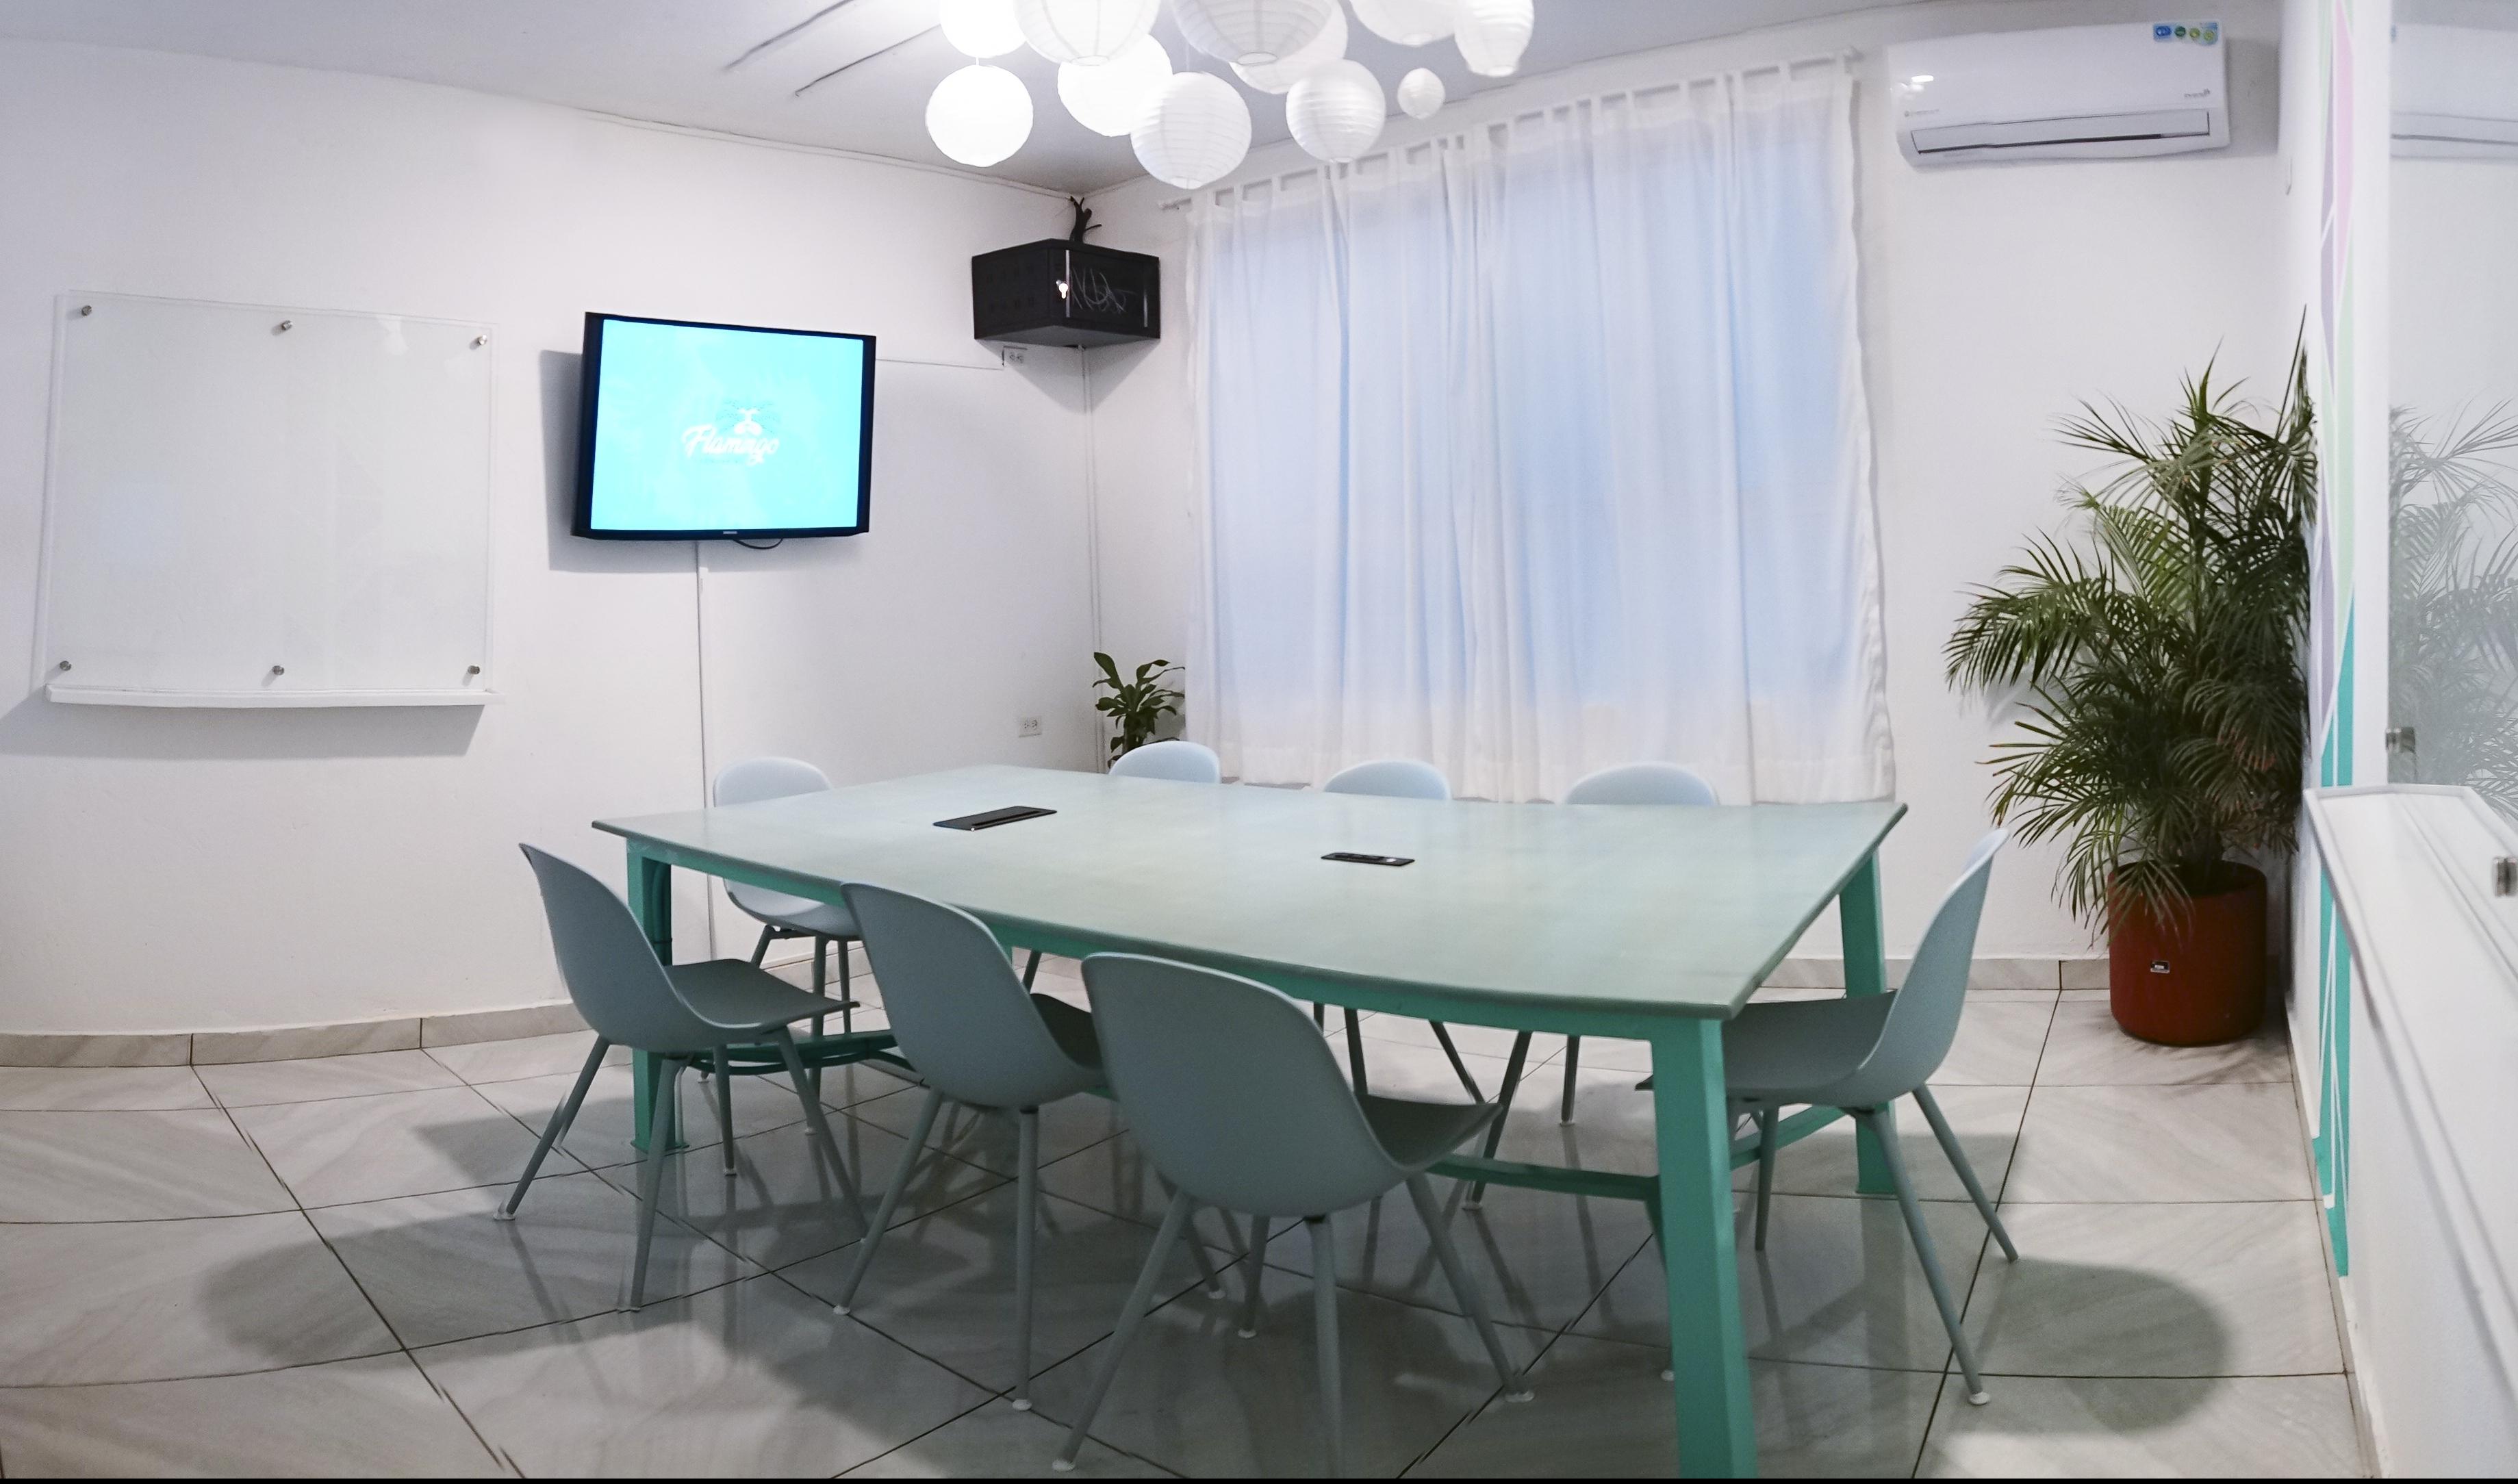 Meeting Room service at Flamingo Coworking in Santa Marta Colombia